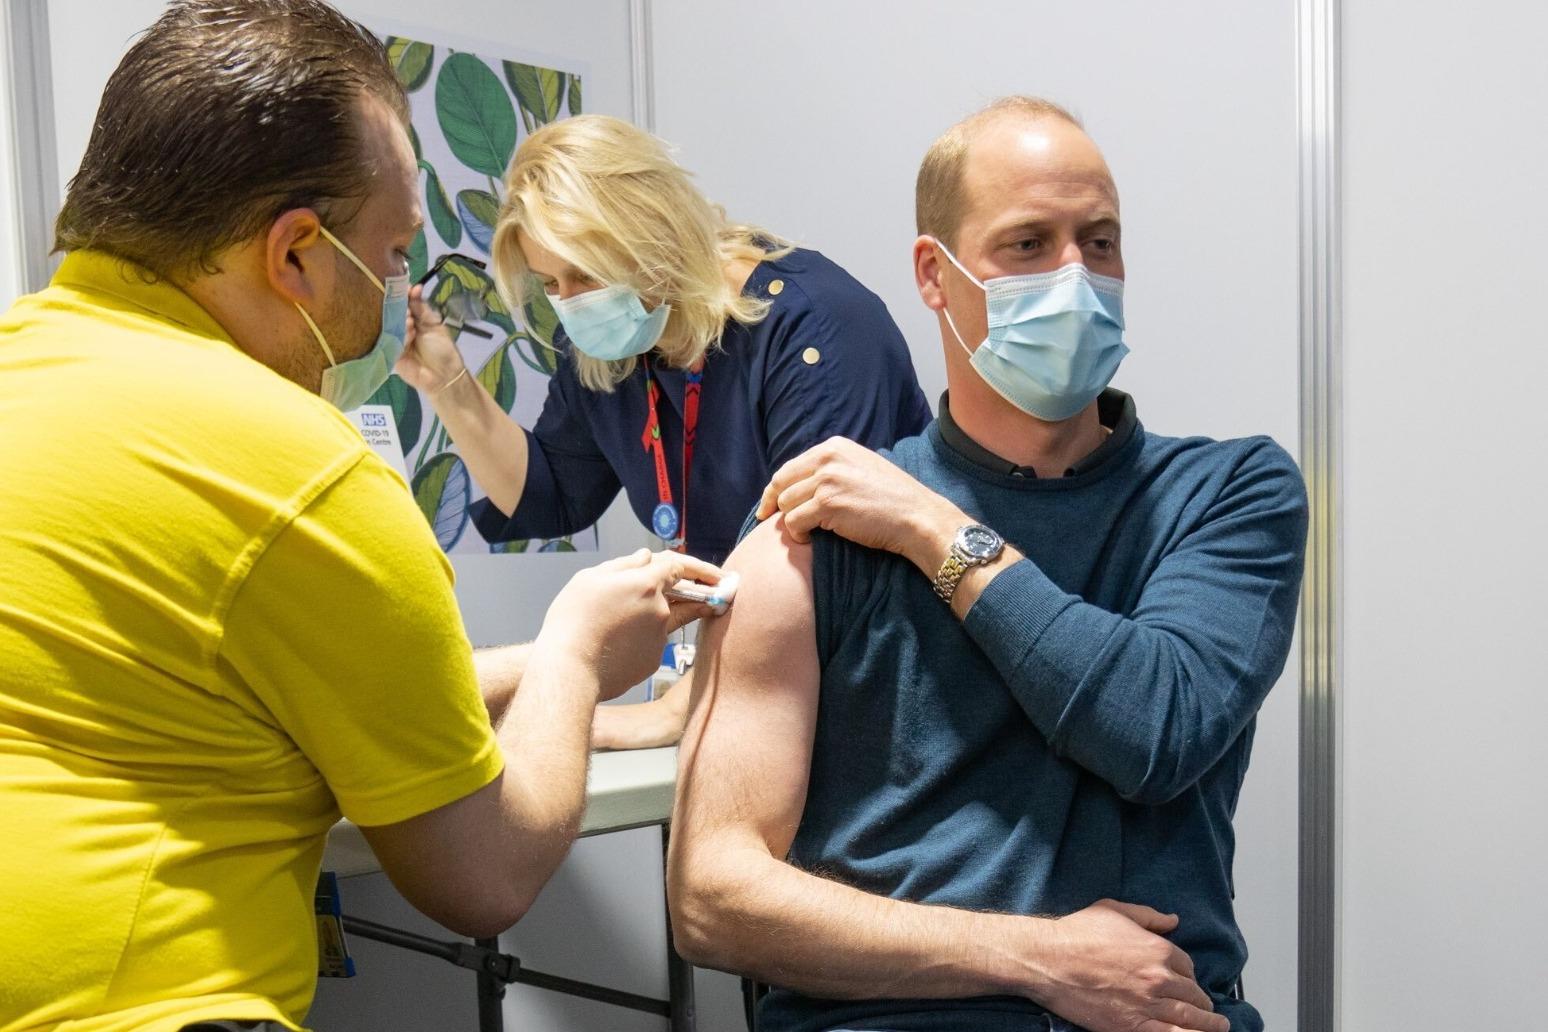 Prince William receives his first coronavirus vaccine dose